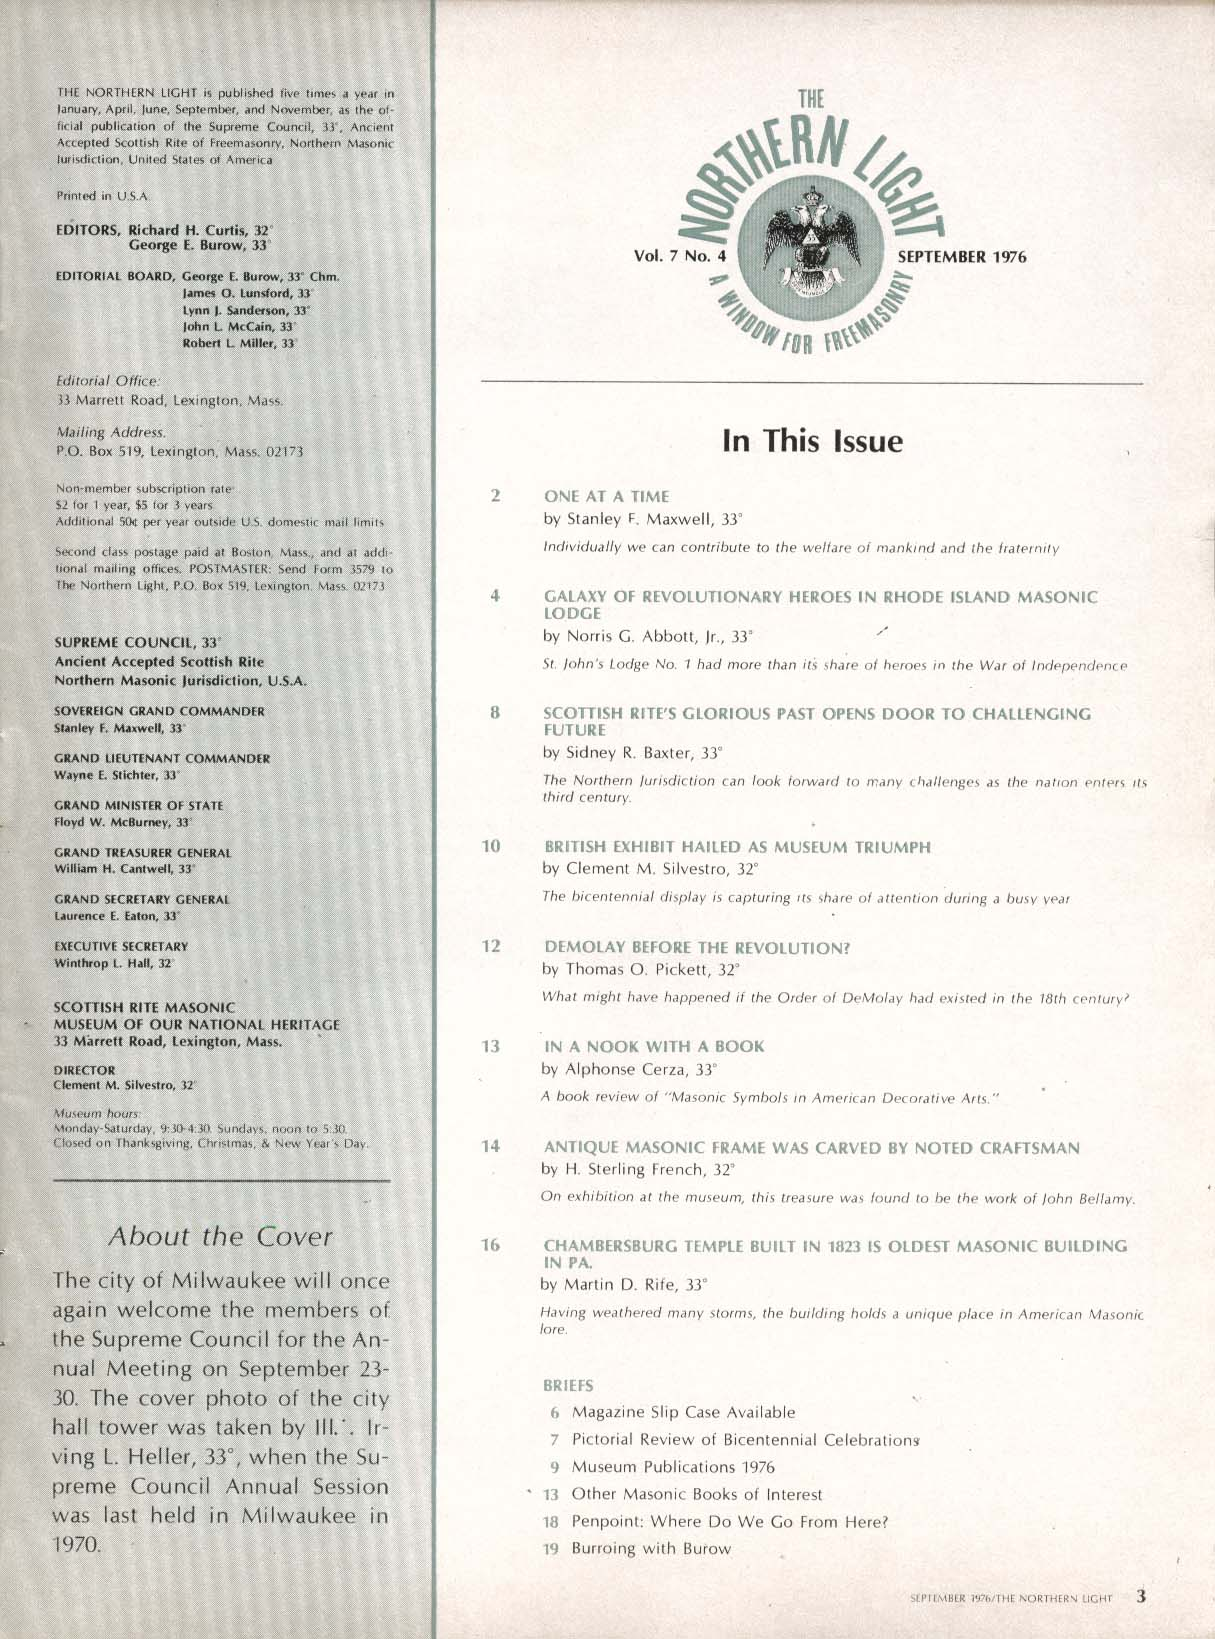 Image for NORTHERN LIGHT Vol 7 #4 Revolutionary Heroes Rhode Island Masonic Lodge 9 1976